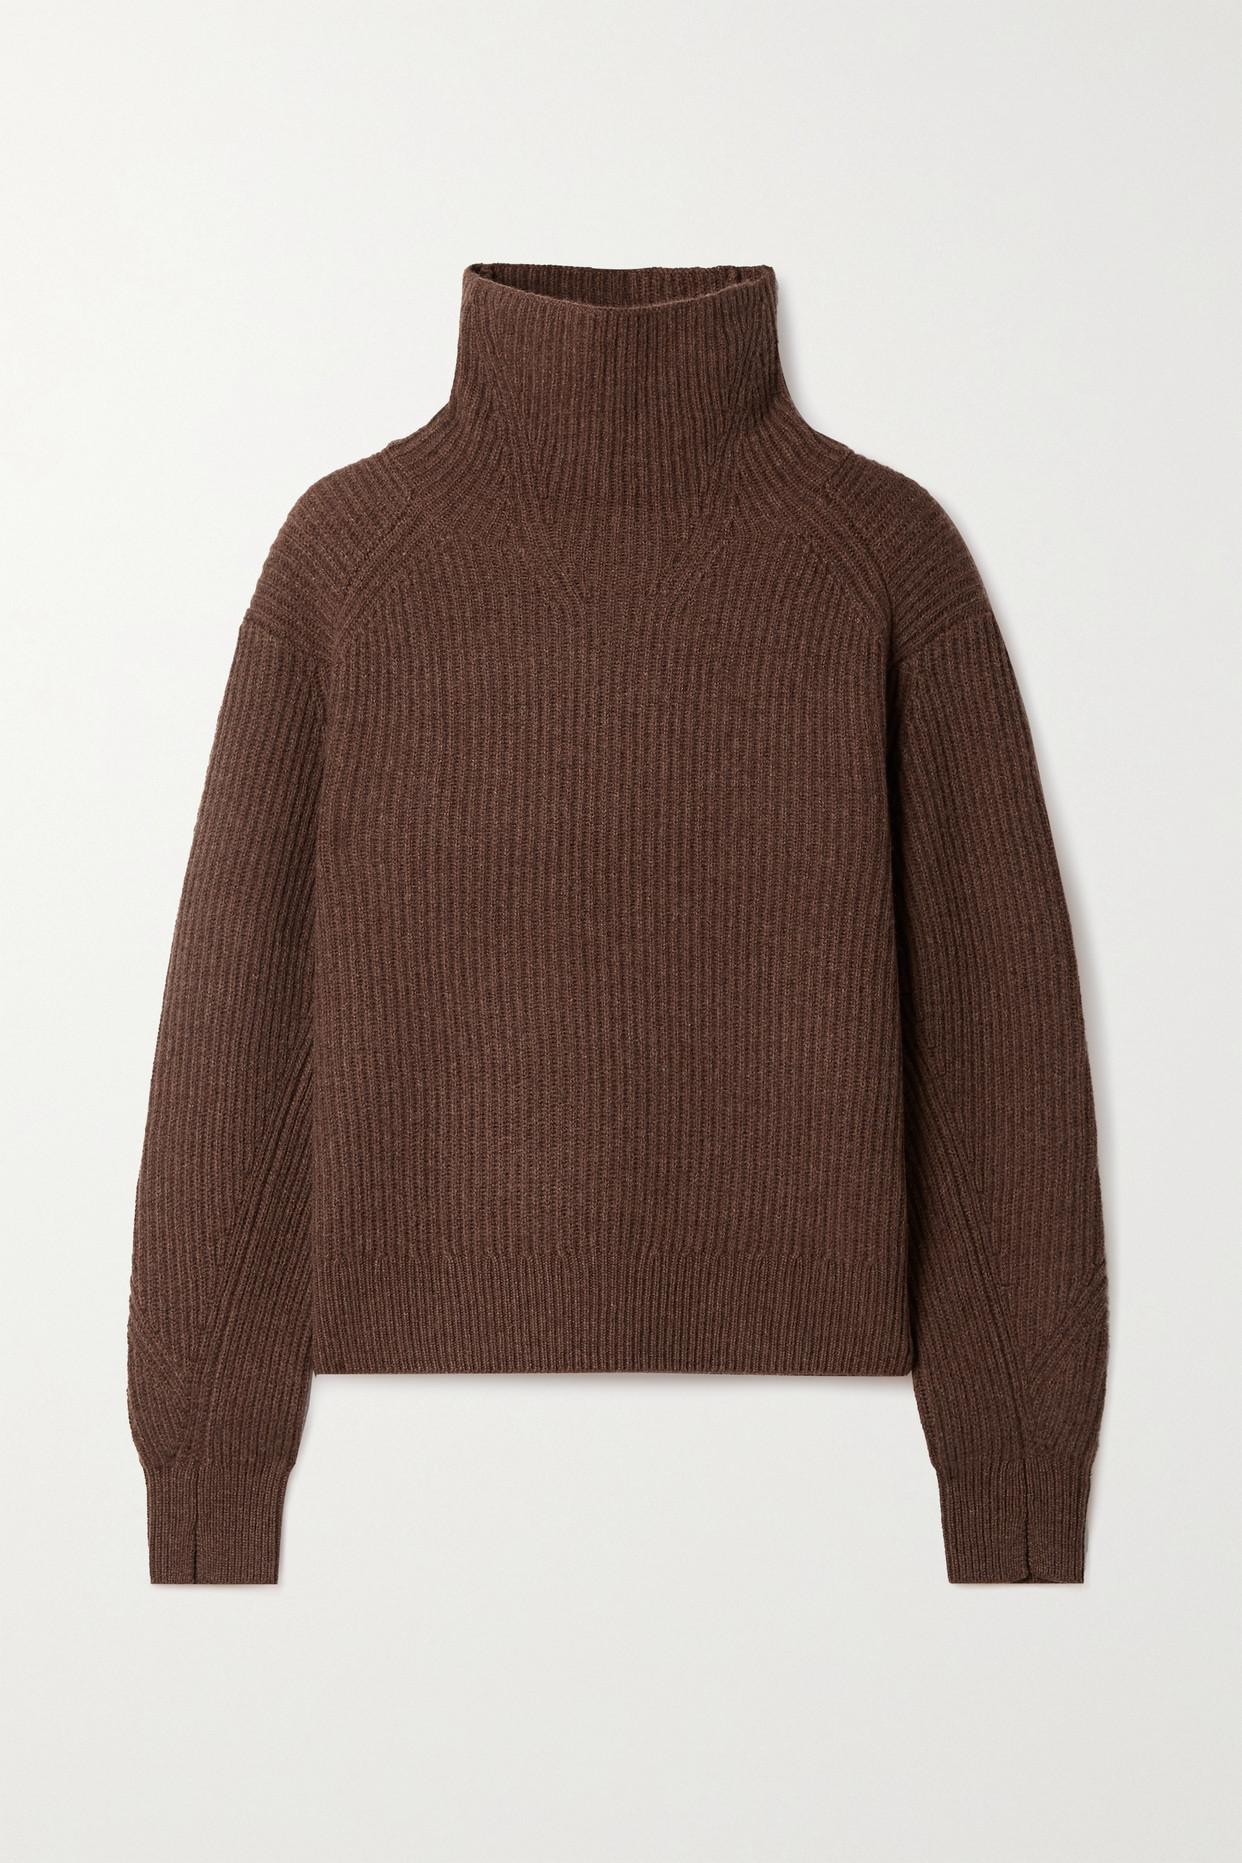 RAG & BONE - Pierce Ribbed Cashmere Turtleneck Sweater - Brown - x small